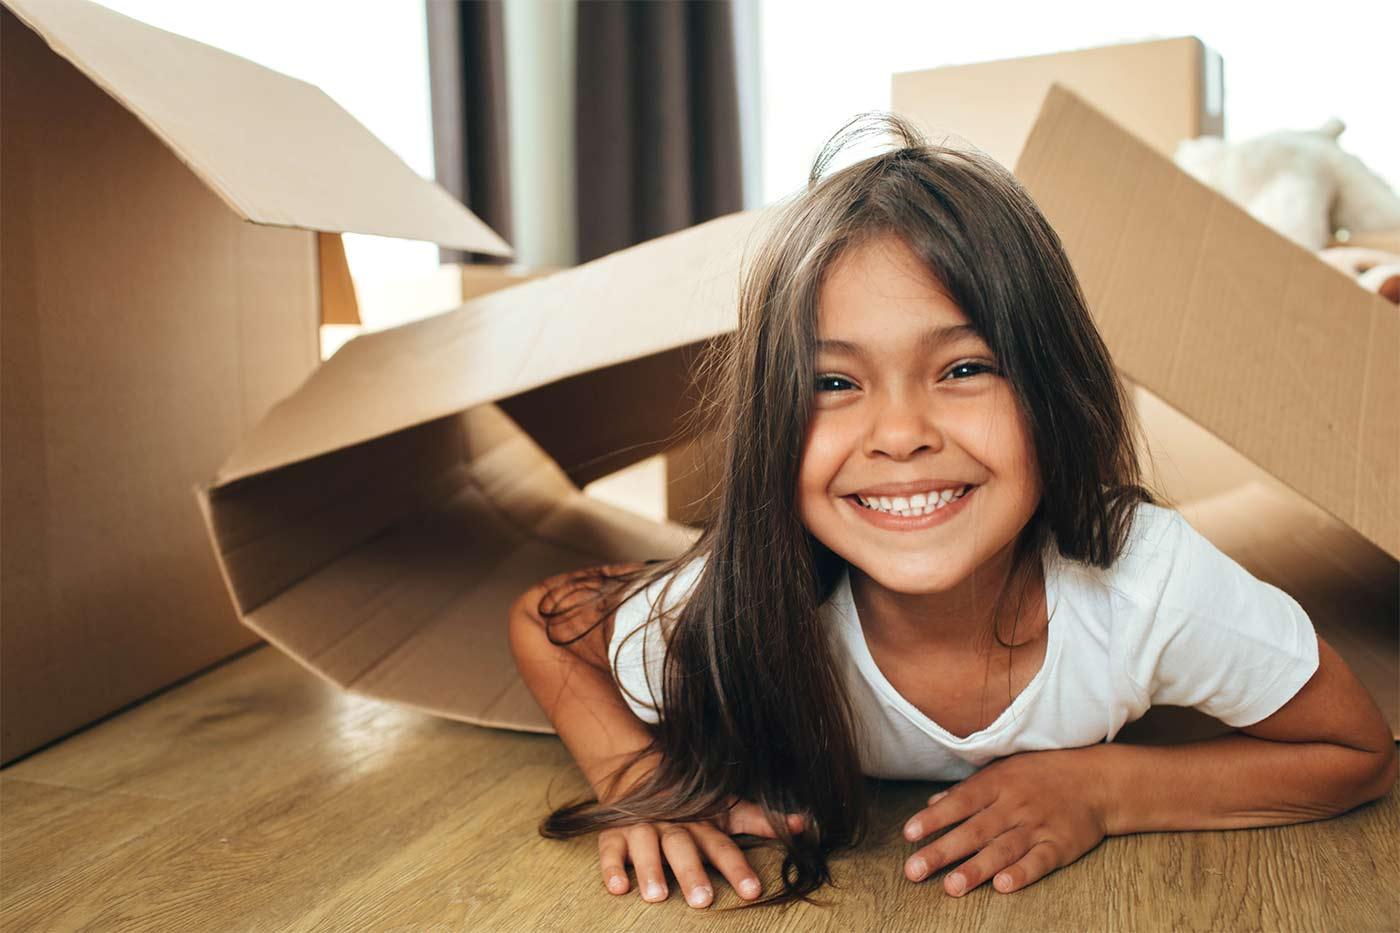 How to raise non-materialistic children